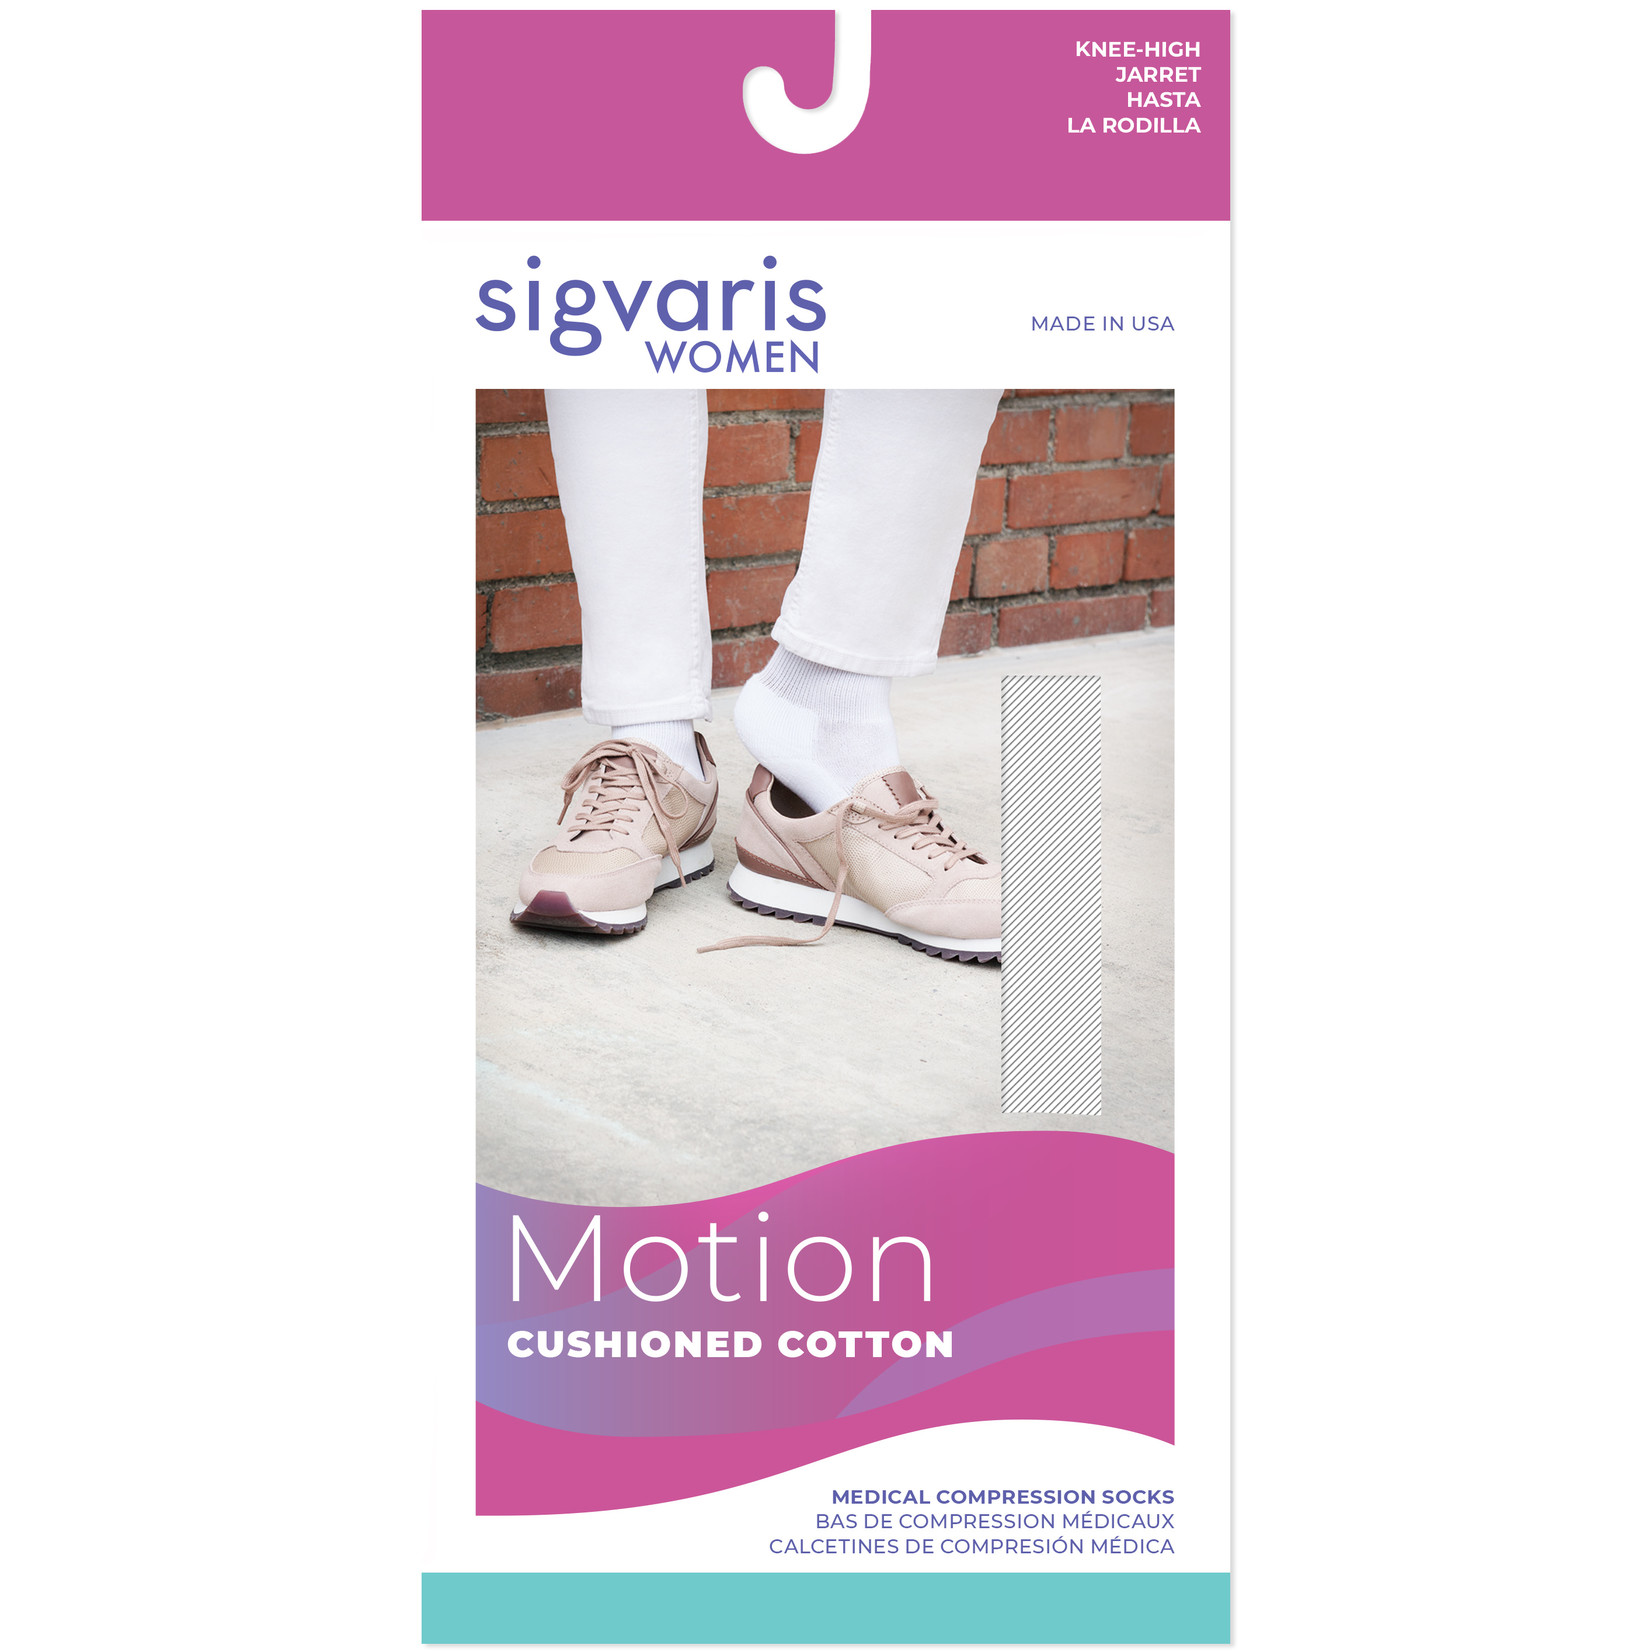 SIGVARIS Women's Motion Cushioned Cotton Calf 20-30mmHg